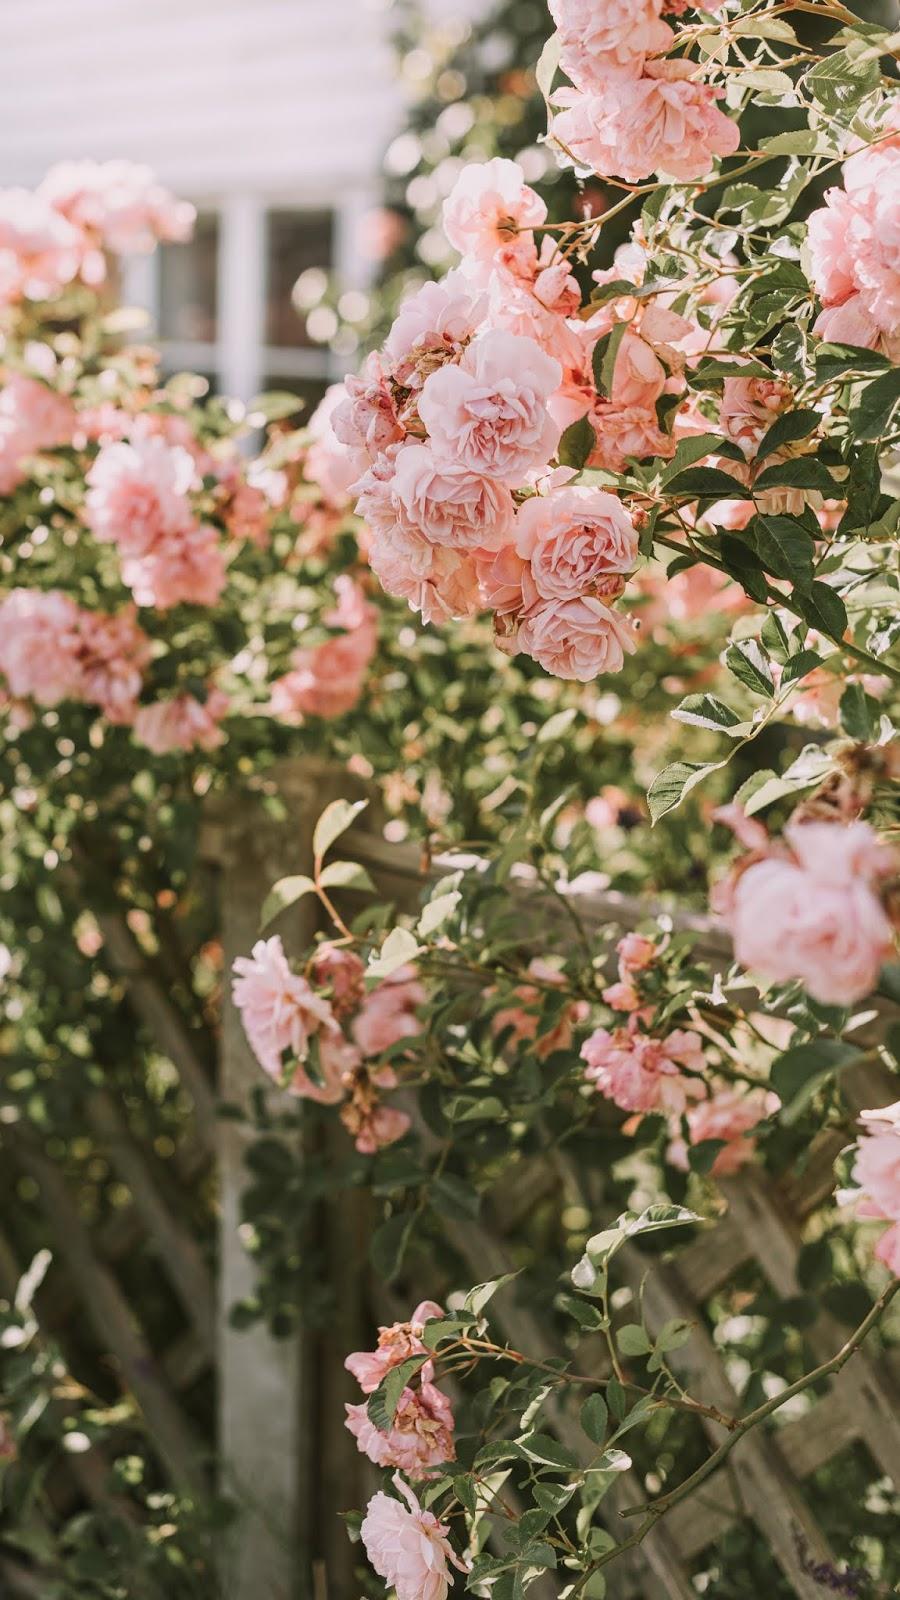 aesthetic vintage pink rose